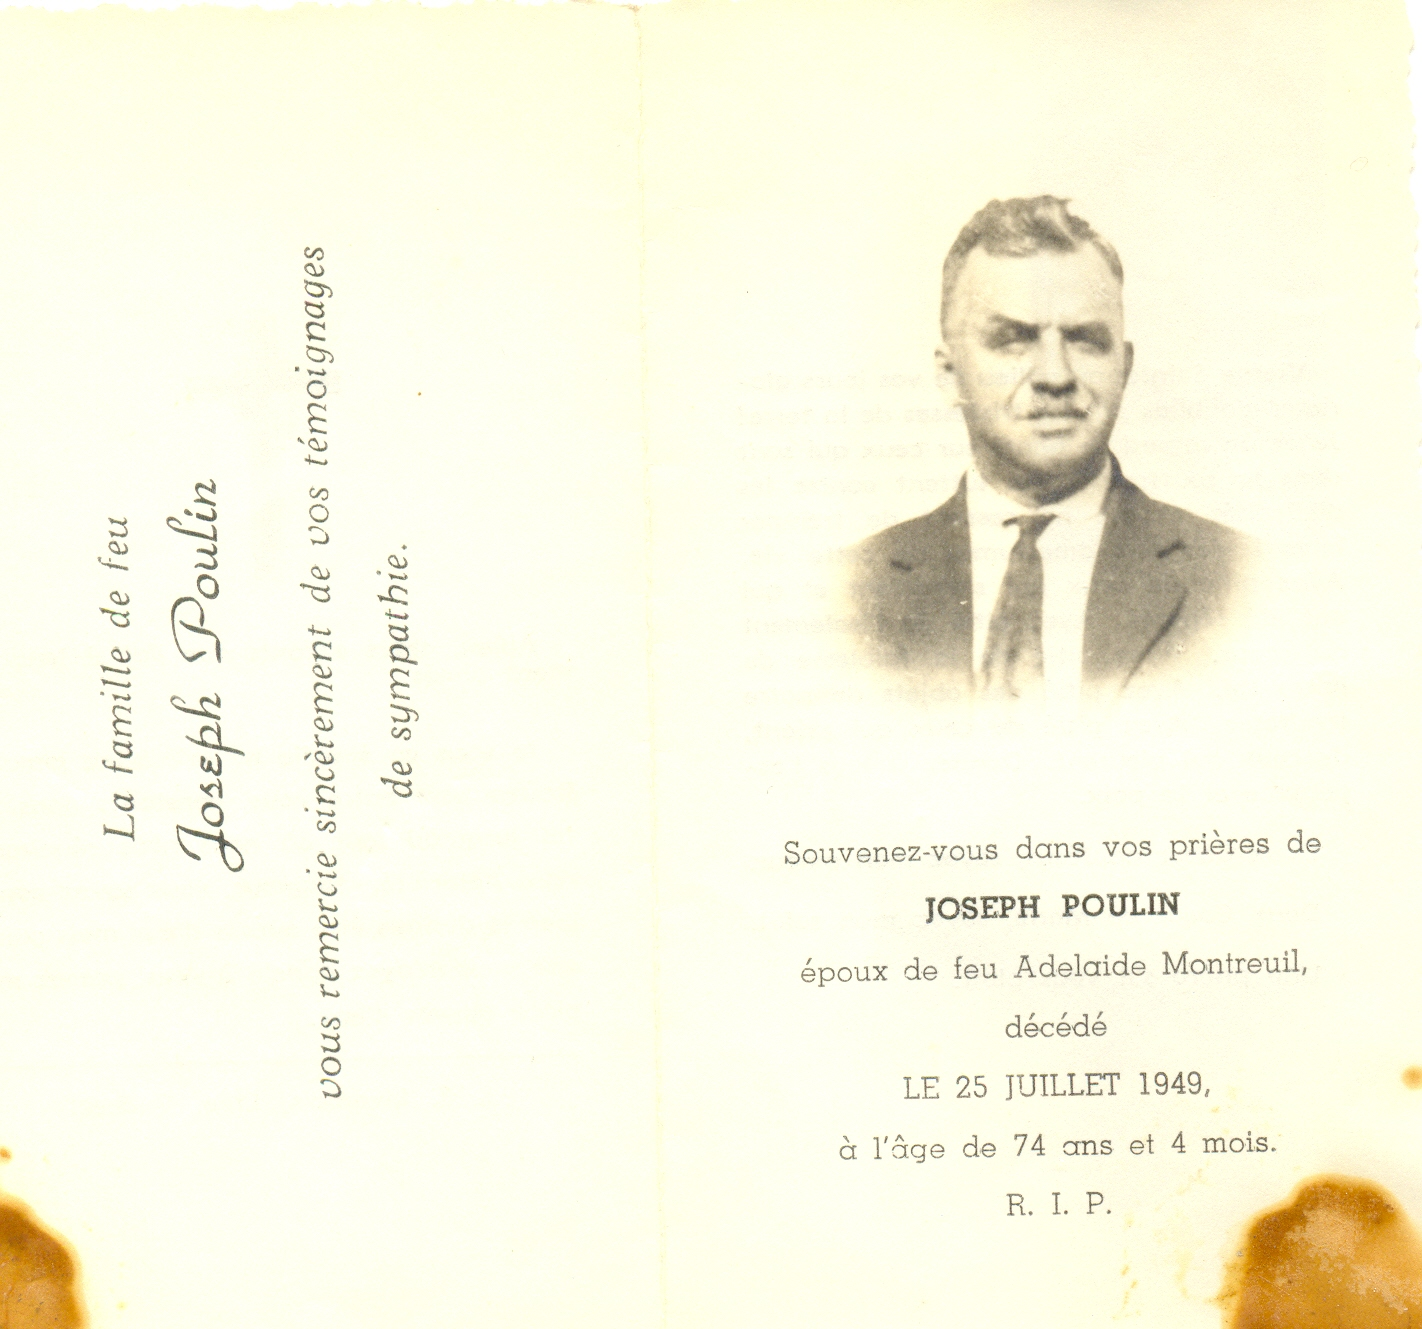 Joseph Poulin 1875-1949